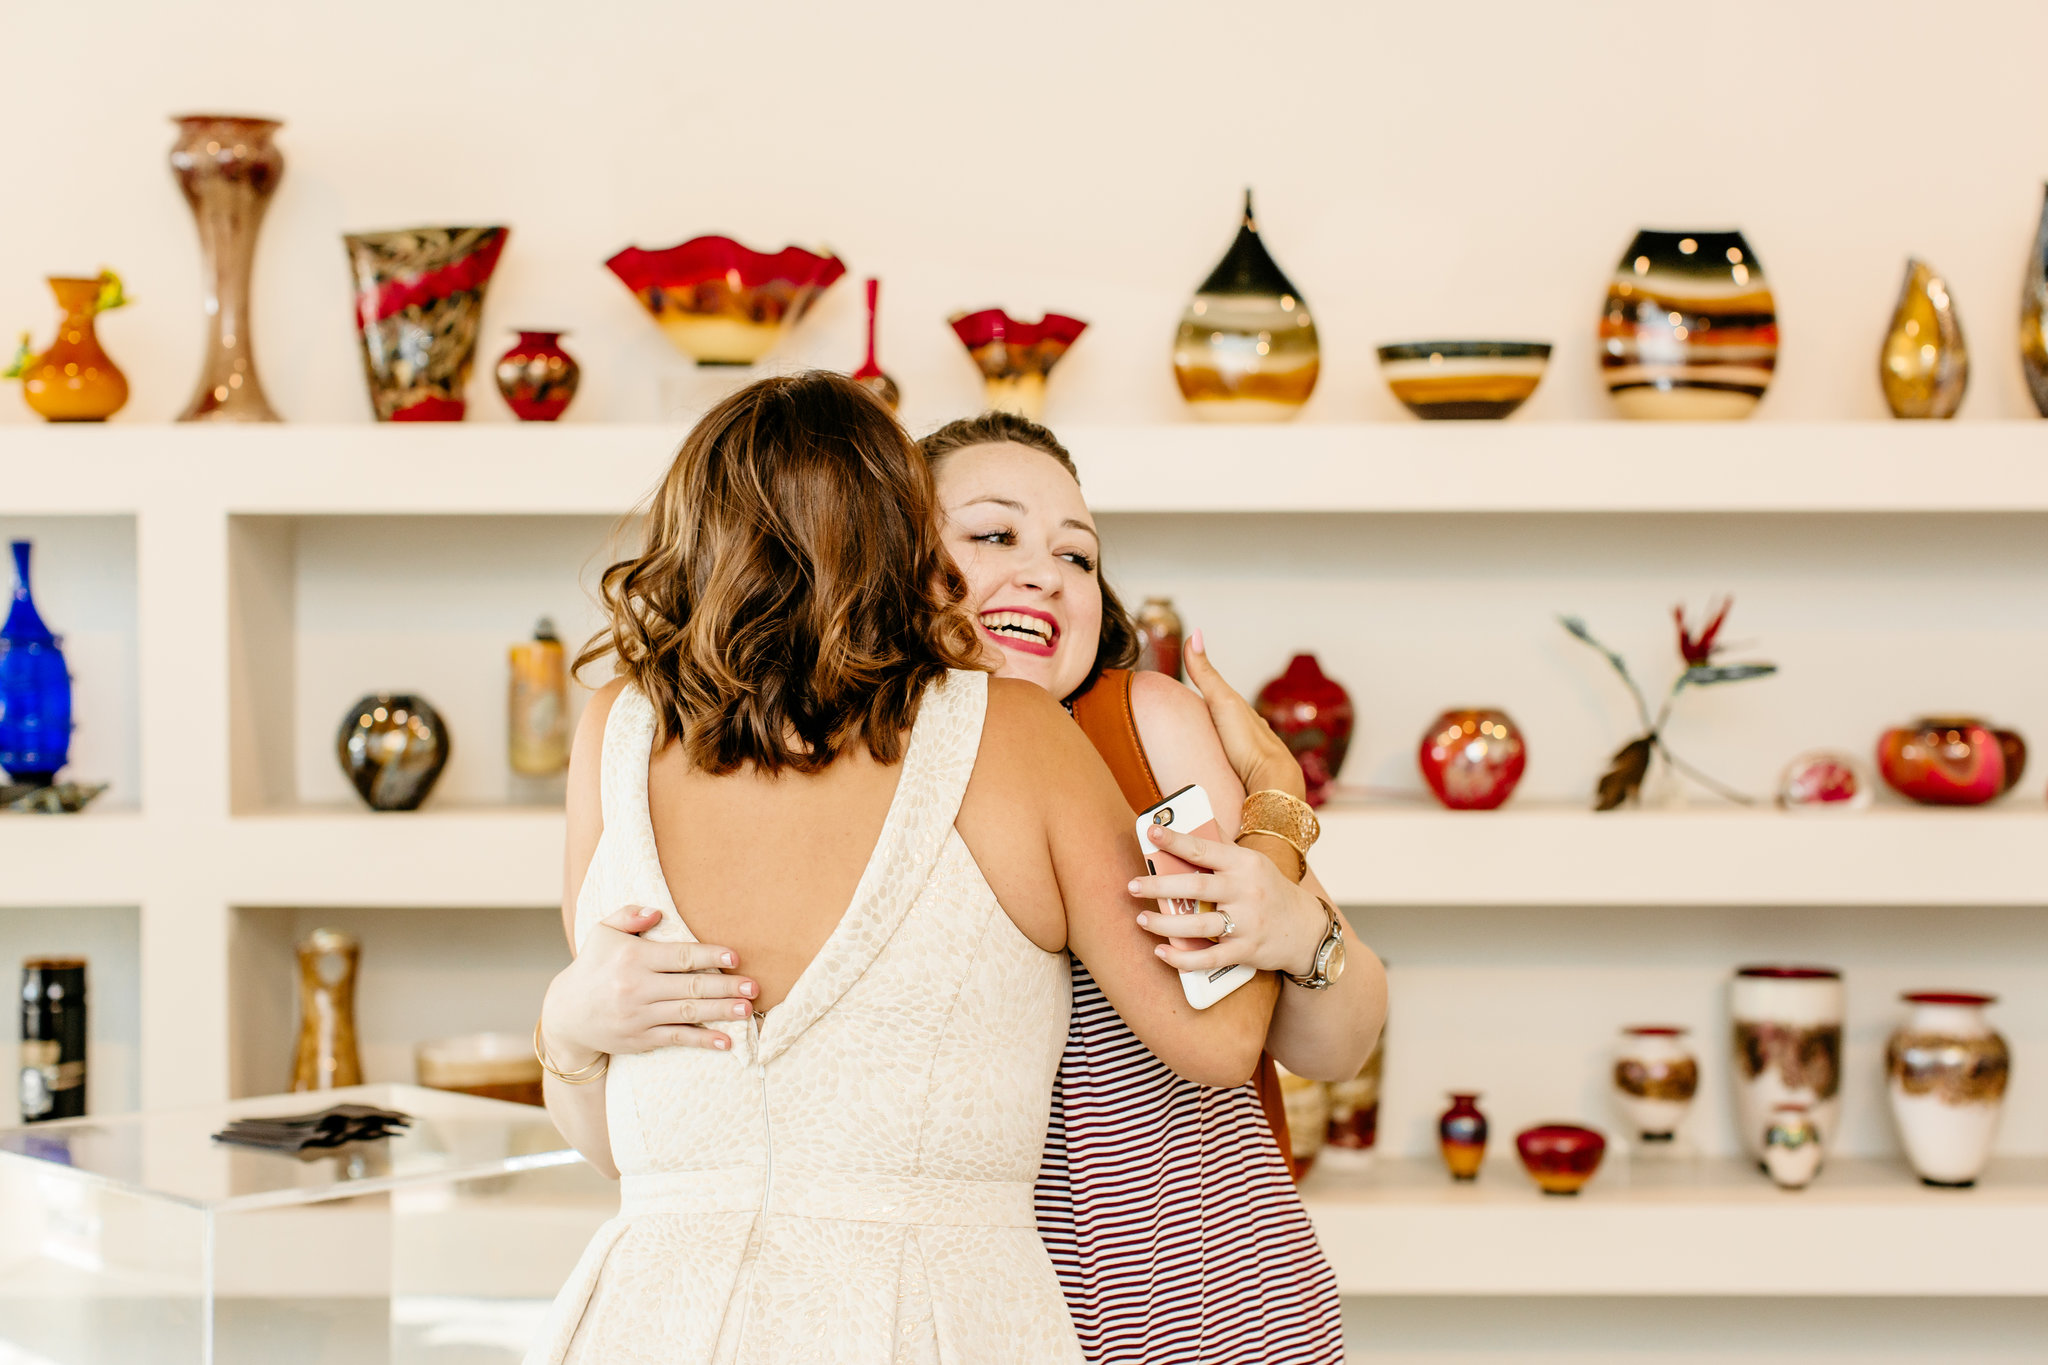 Alexa-Vossler-Photo_Dallas-Event-Photographer_Brite-Bar-Beauty-2018-Lipstick-Launch-Party-24.jpg